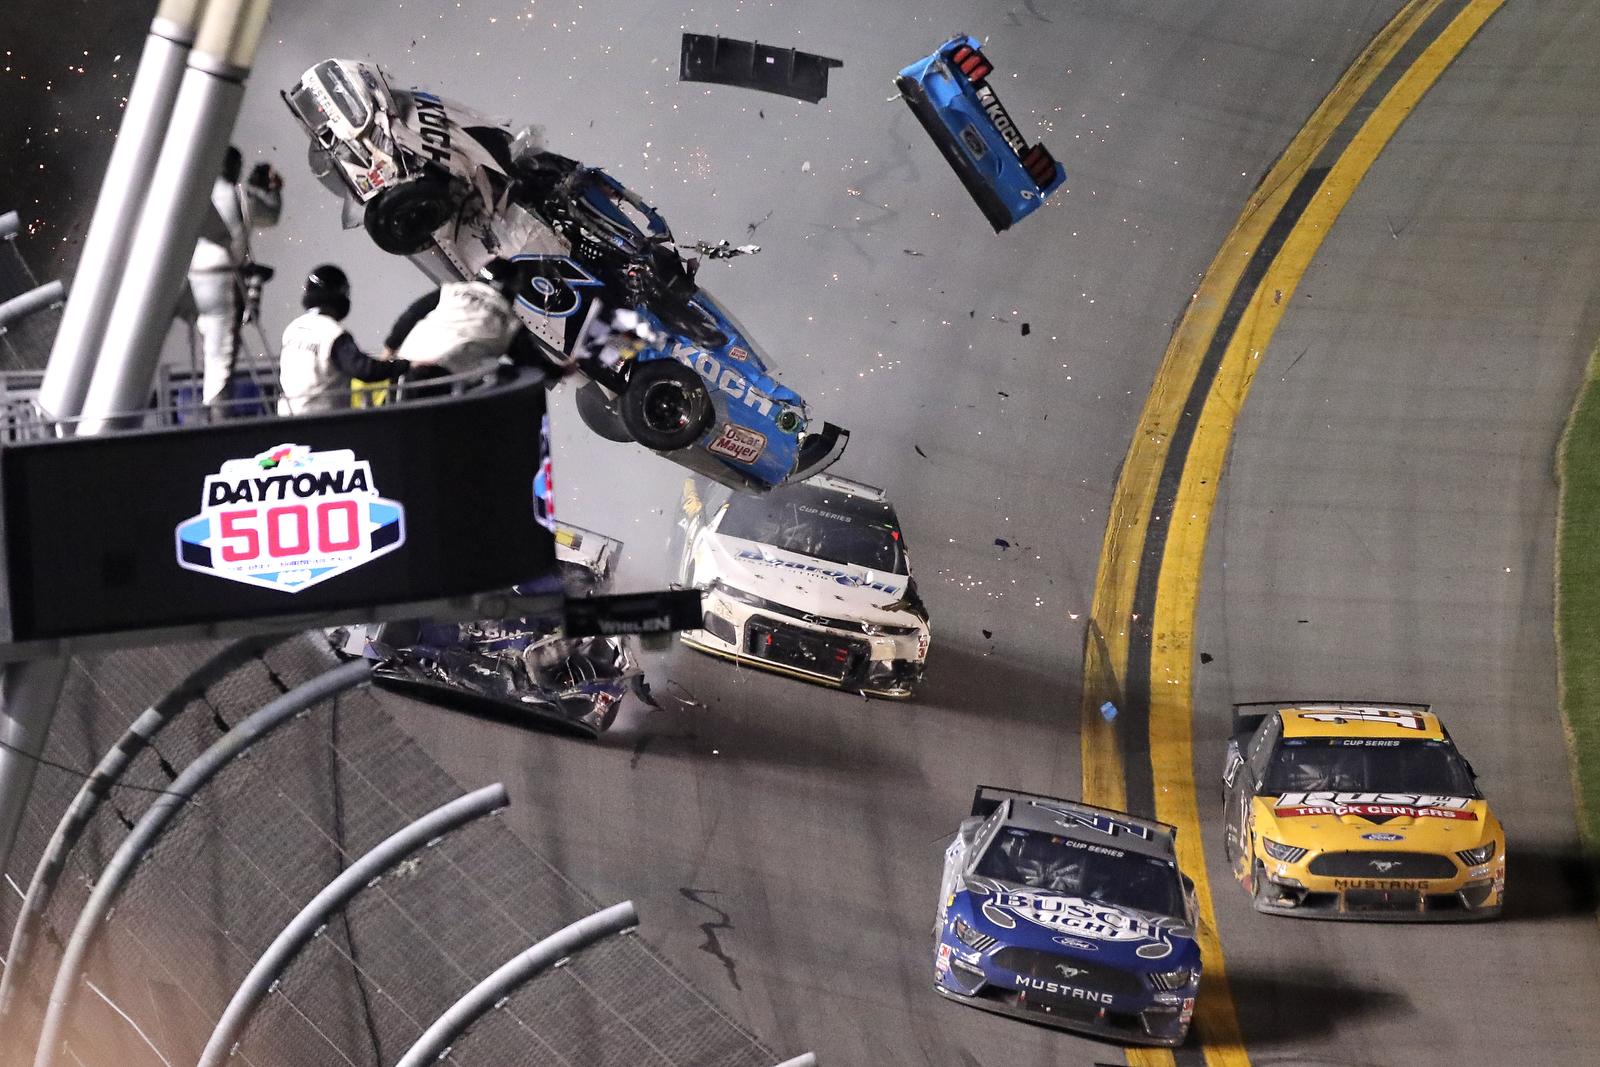 Ryan Newman (6) crashes on the last lap of the NASCAR Daytona 500 auto race at Daytona International Speedway, Monday, Feb. 17, 2020, in Daytona Beach, Fla. AP